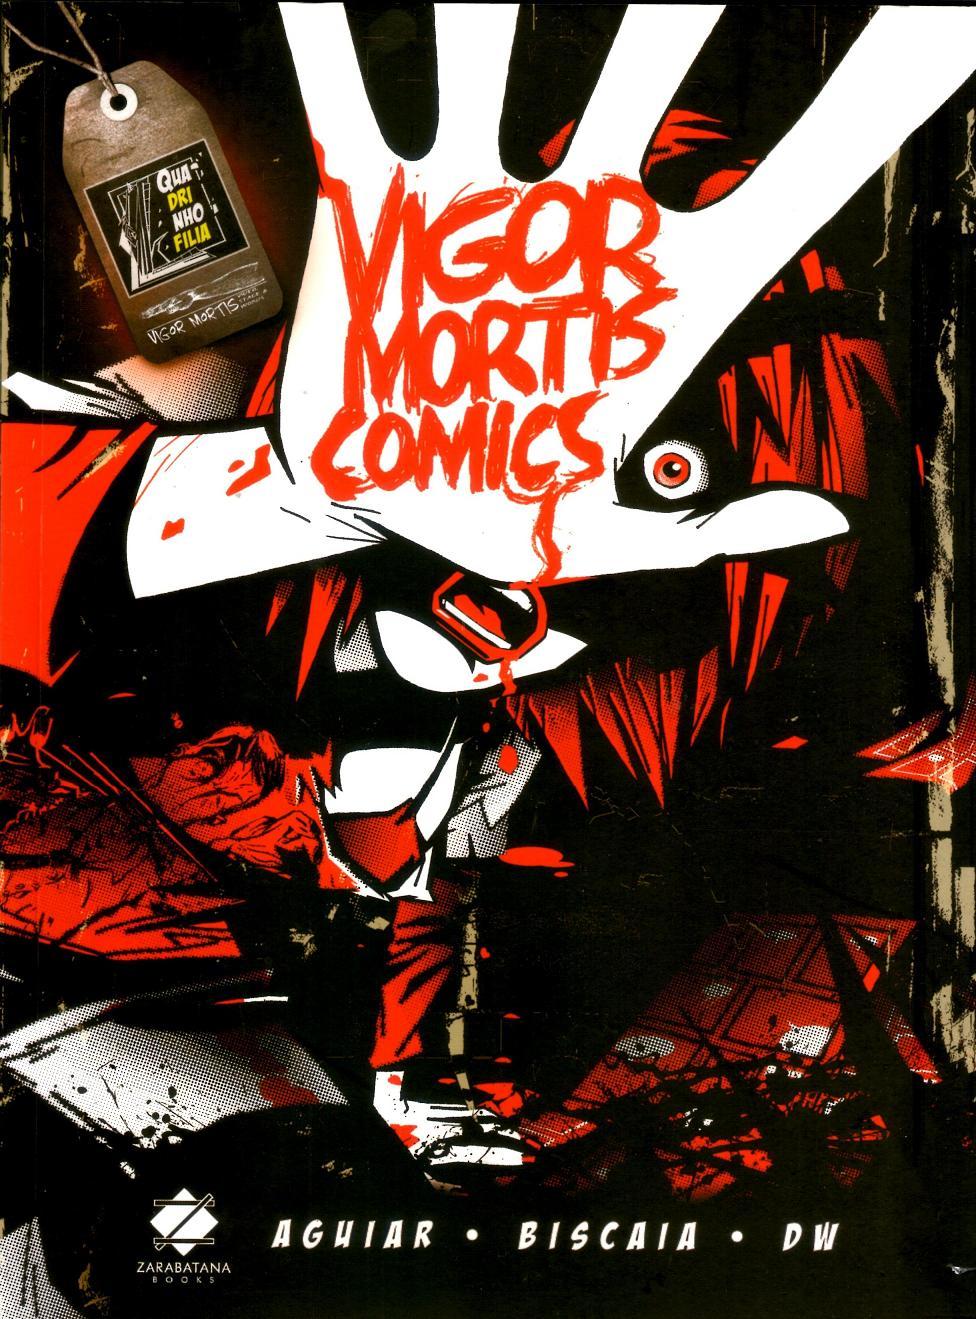 Vigor Mortis Comics